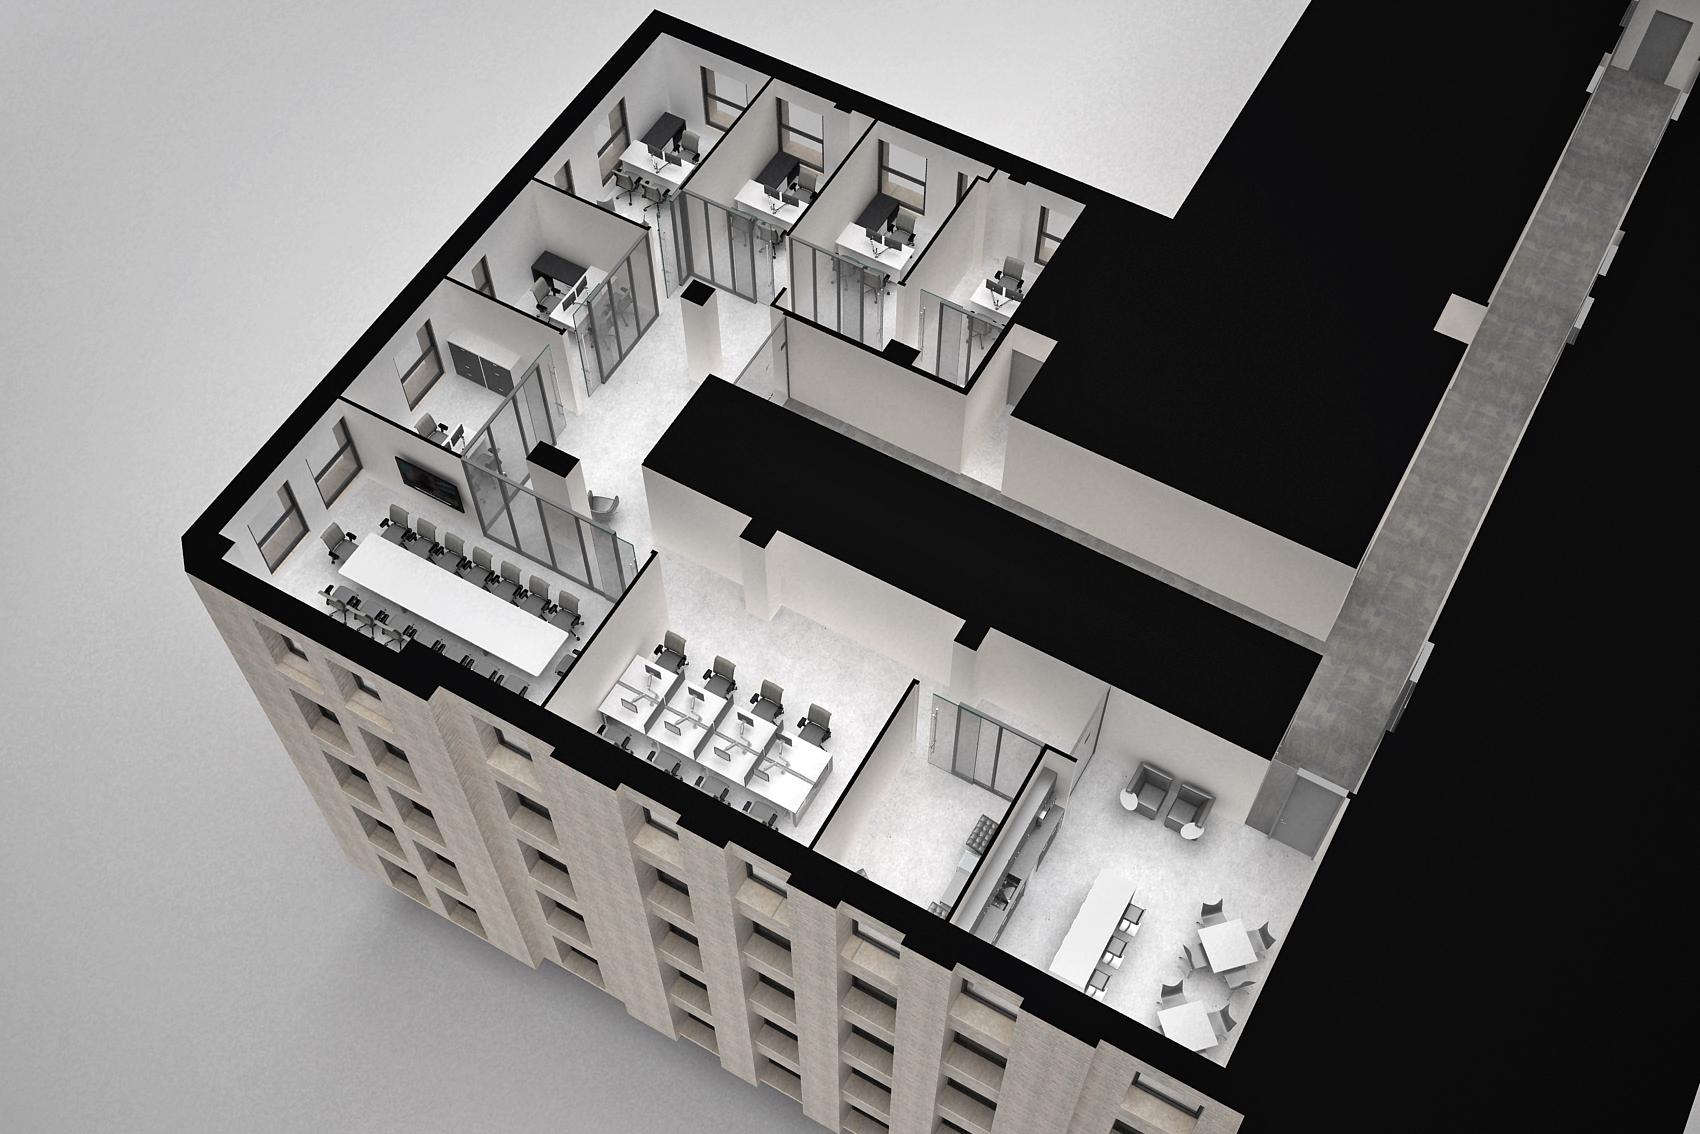 MARINE BUILDING